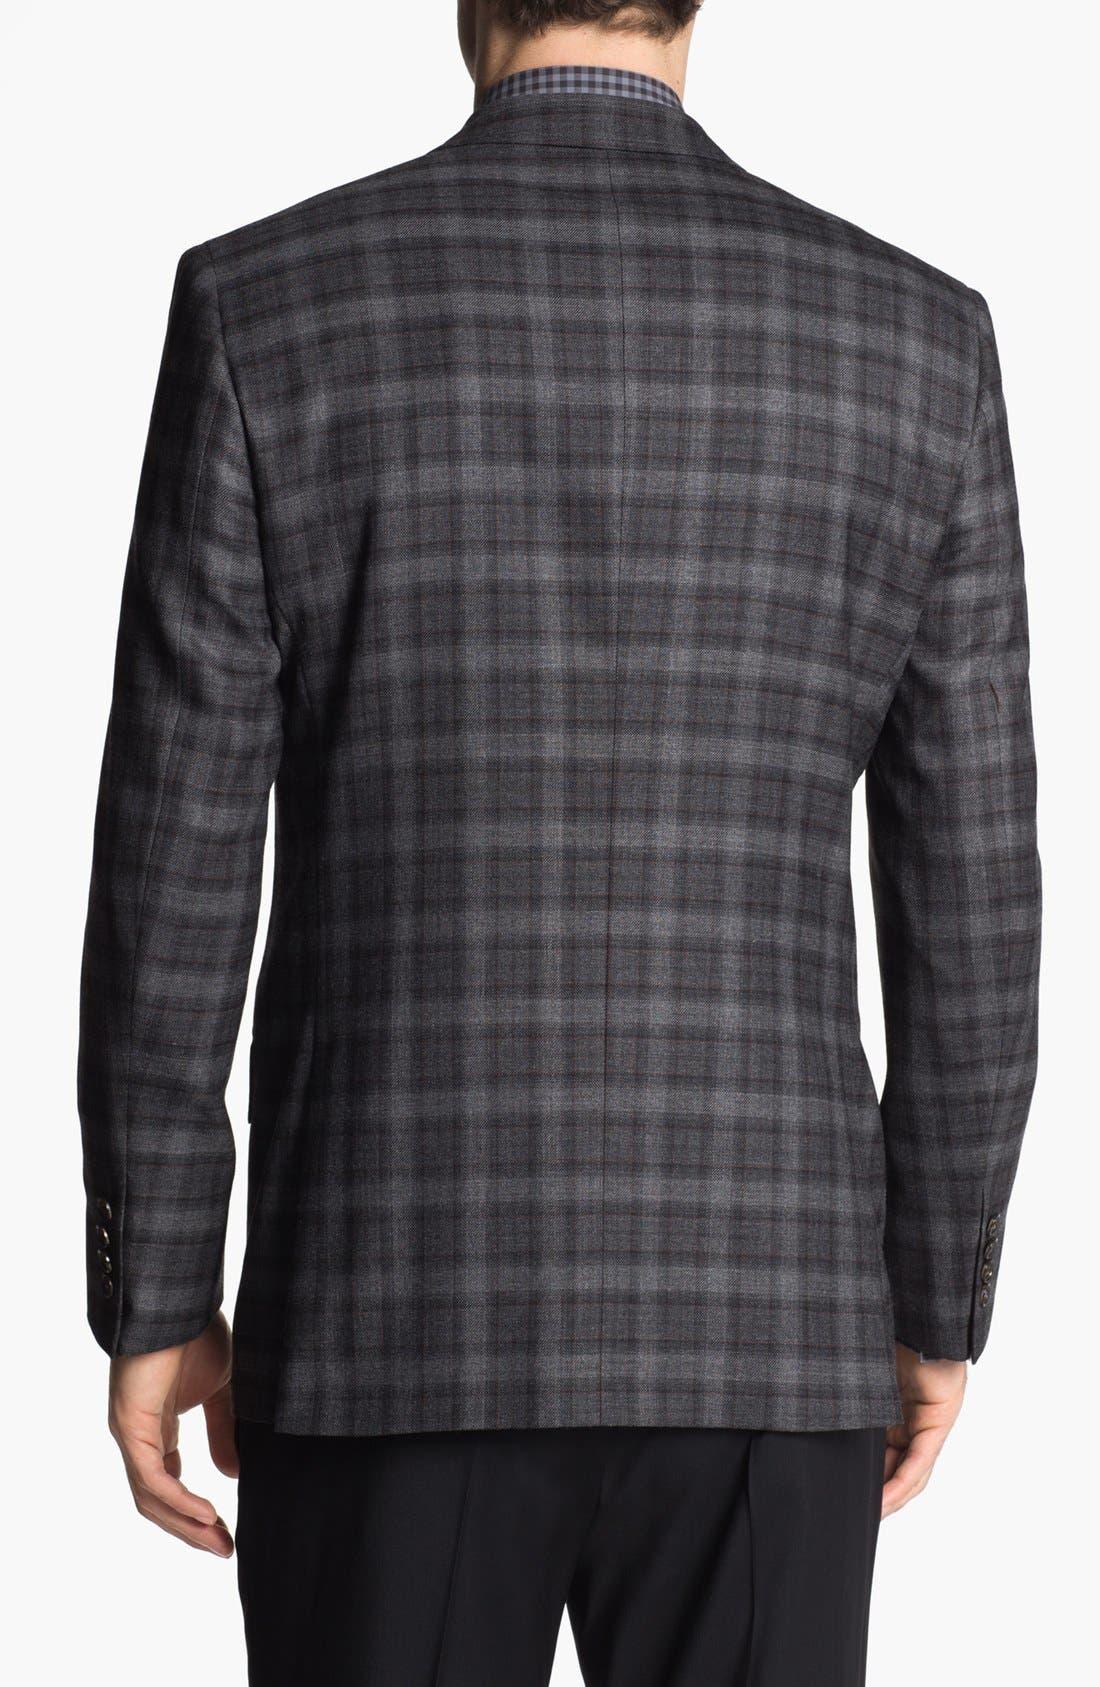 TED BAKER LONDON, 'Jones' Trim Fit Plaid Sportcoat, Alternate thumbnail 3, color, 020